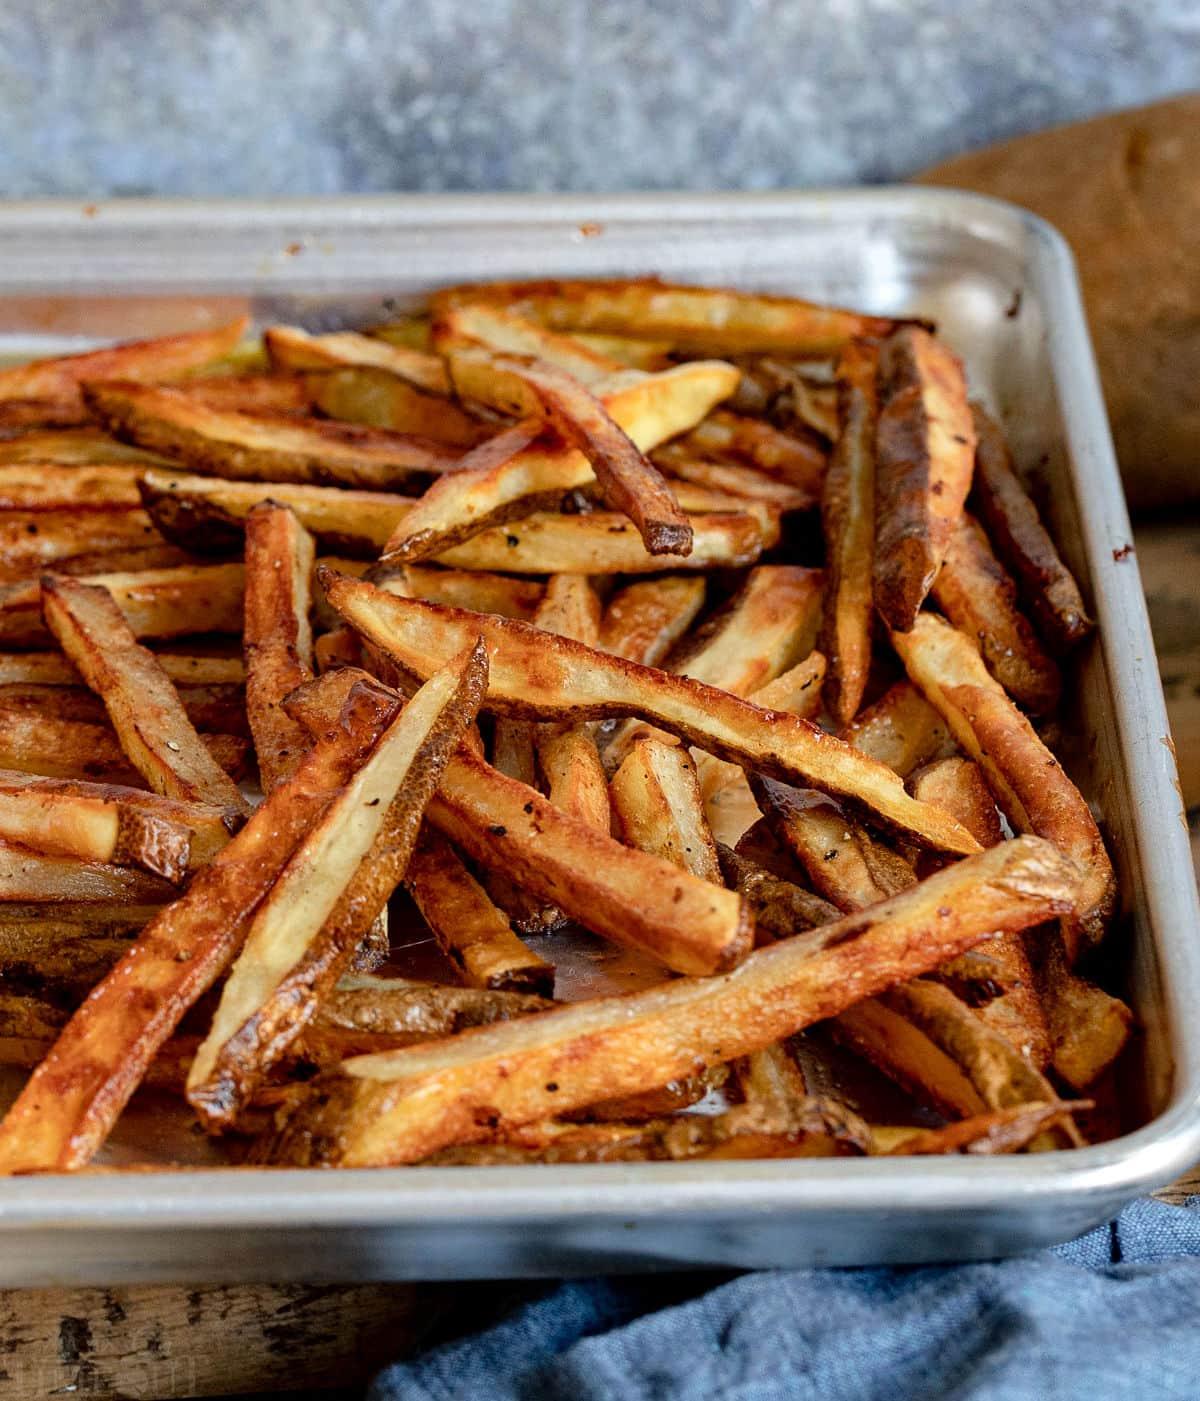 lots of crispy oven fries on baking sheet.